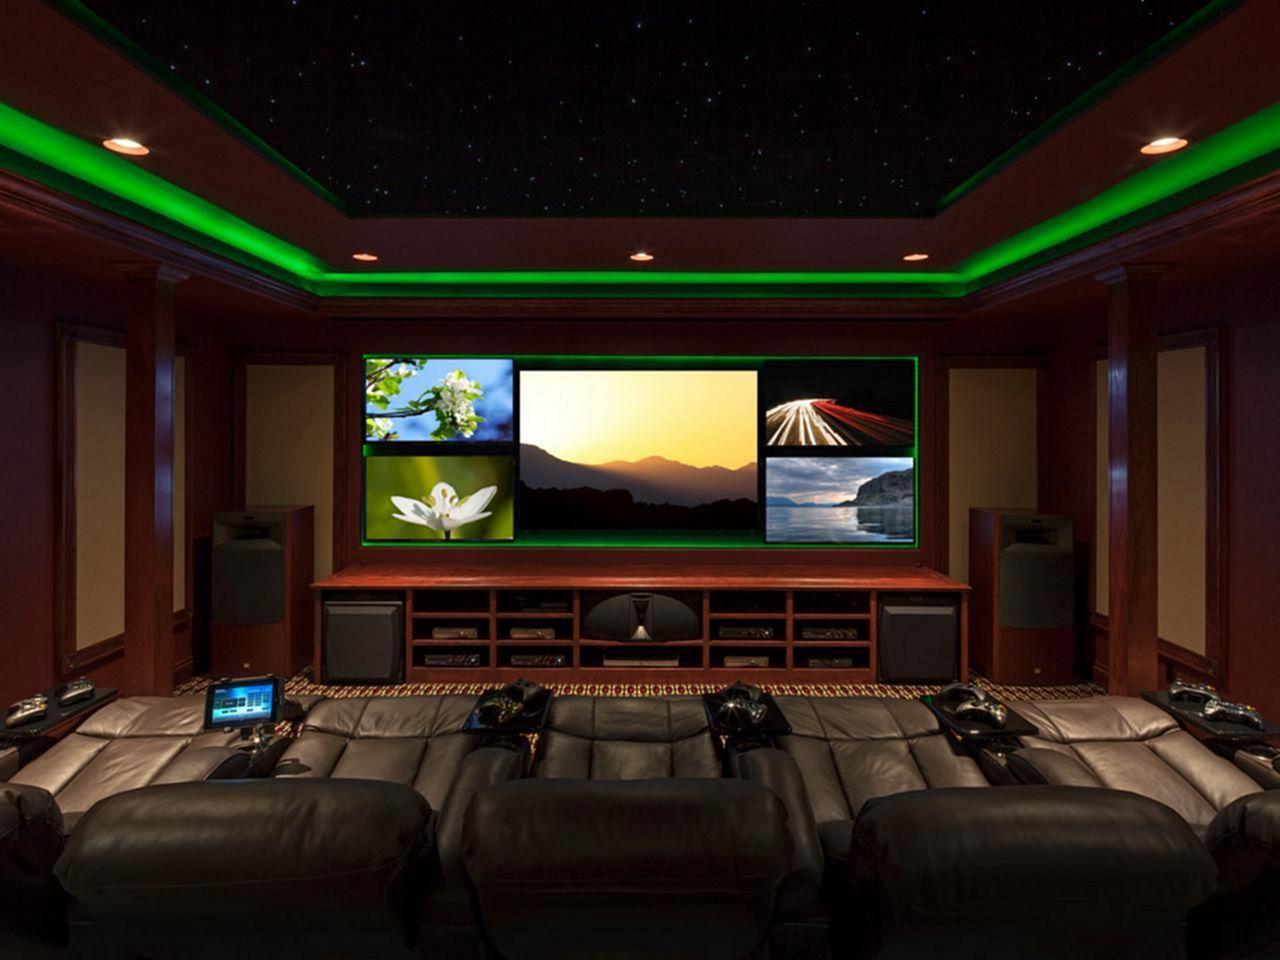 50 Cozy Small Movie Room Design Ideas